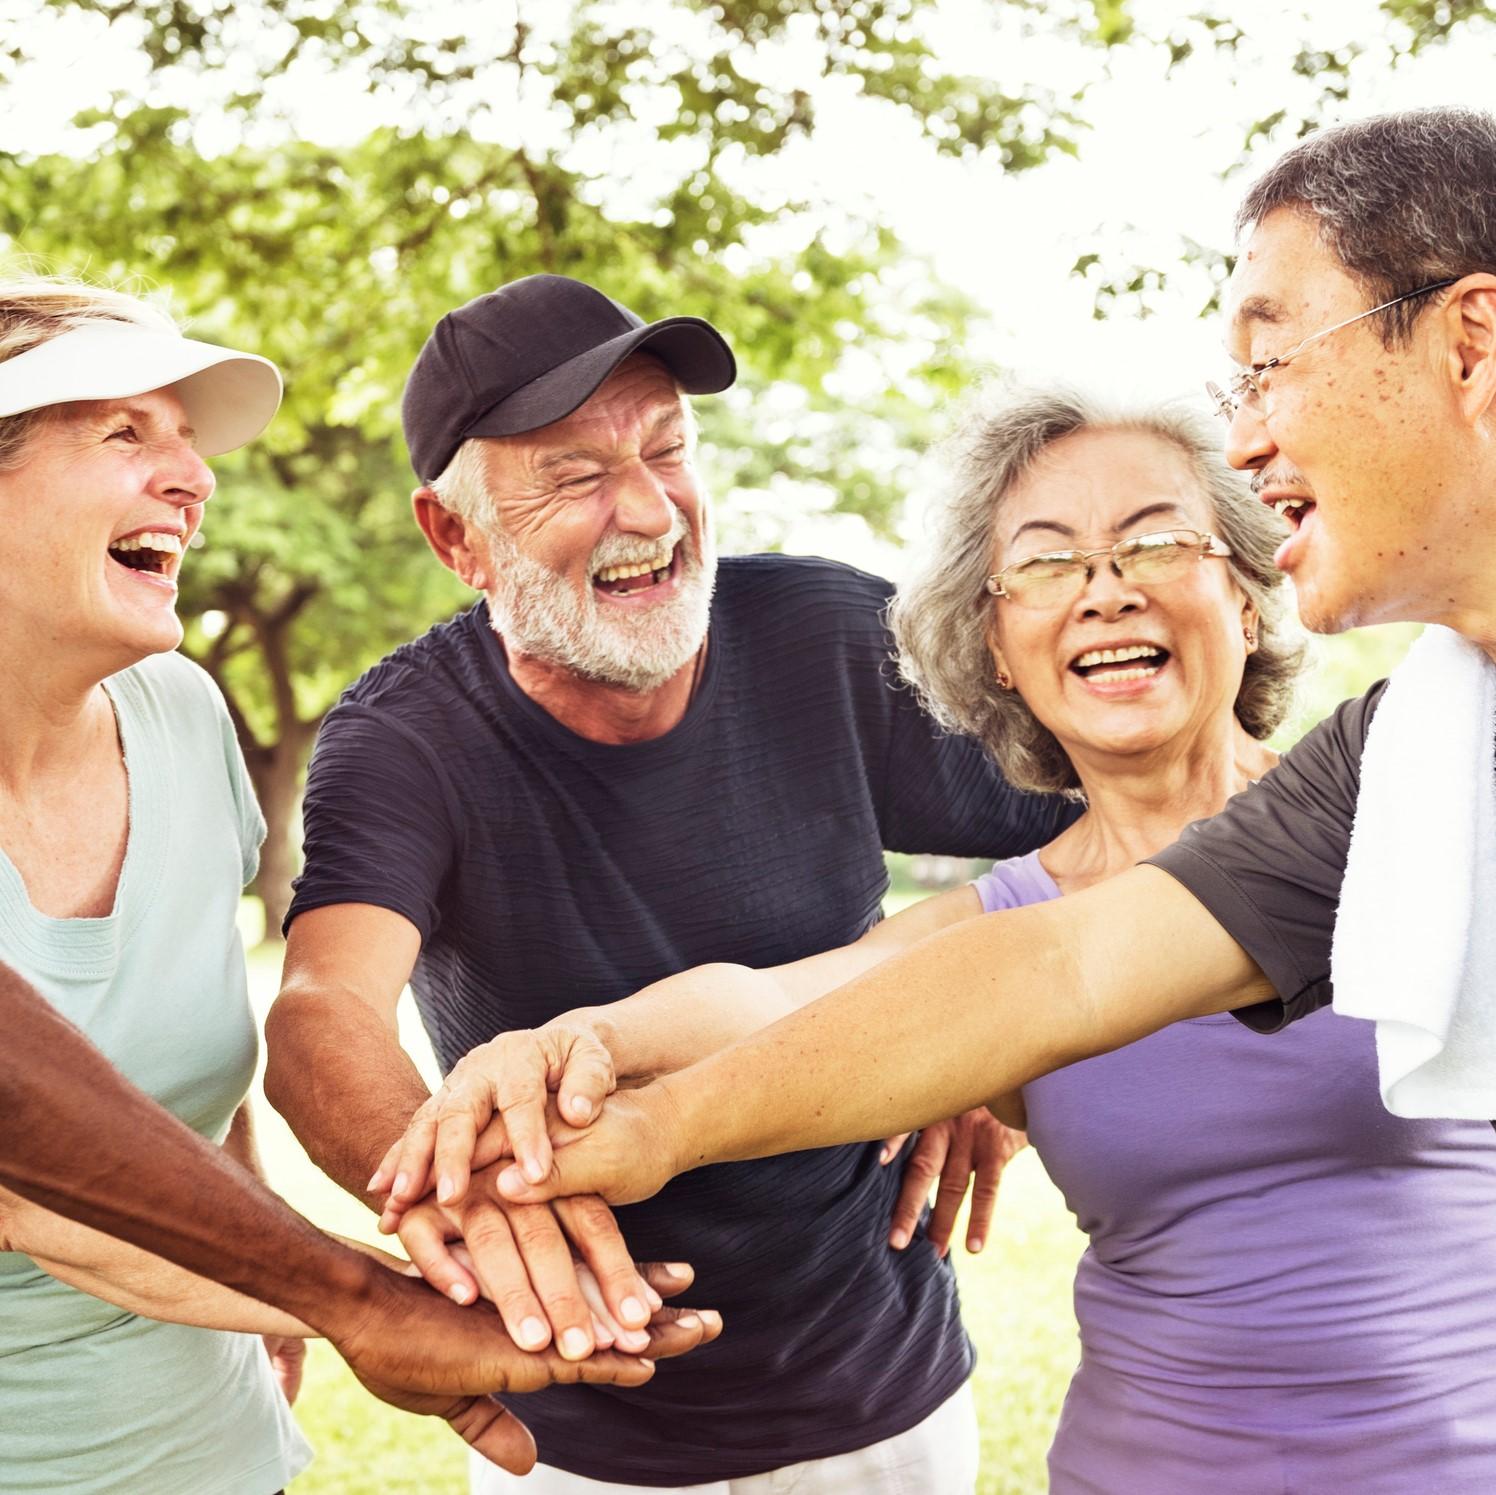 Group of seniors smiling together. Togetherness concept.